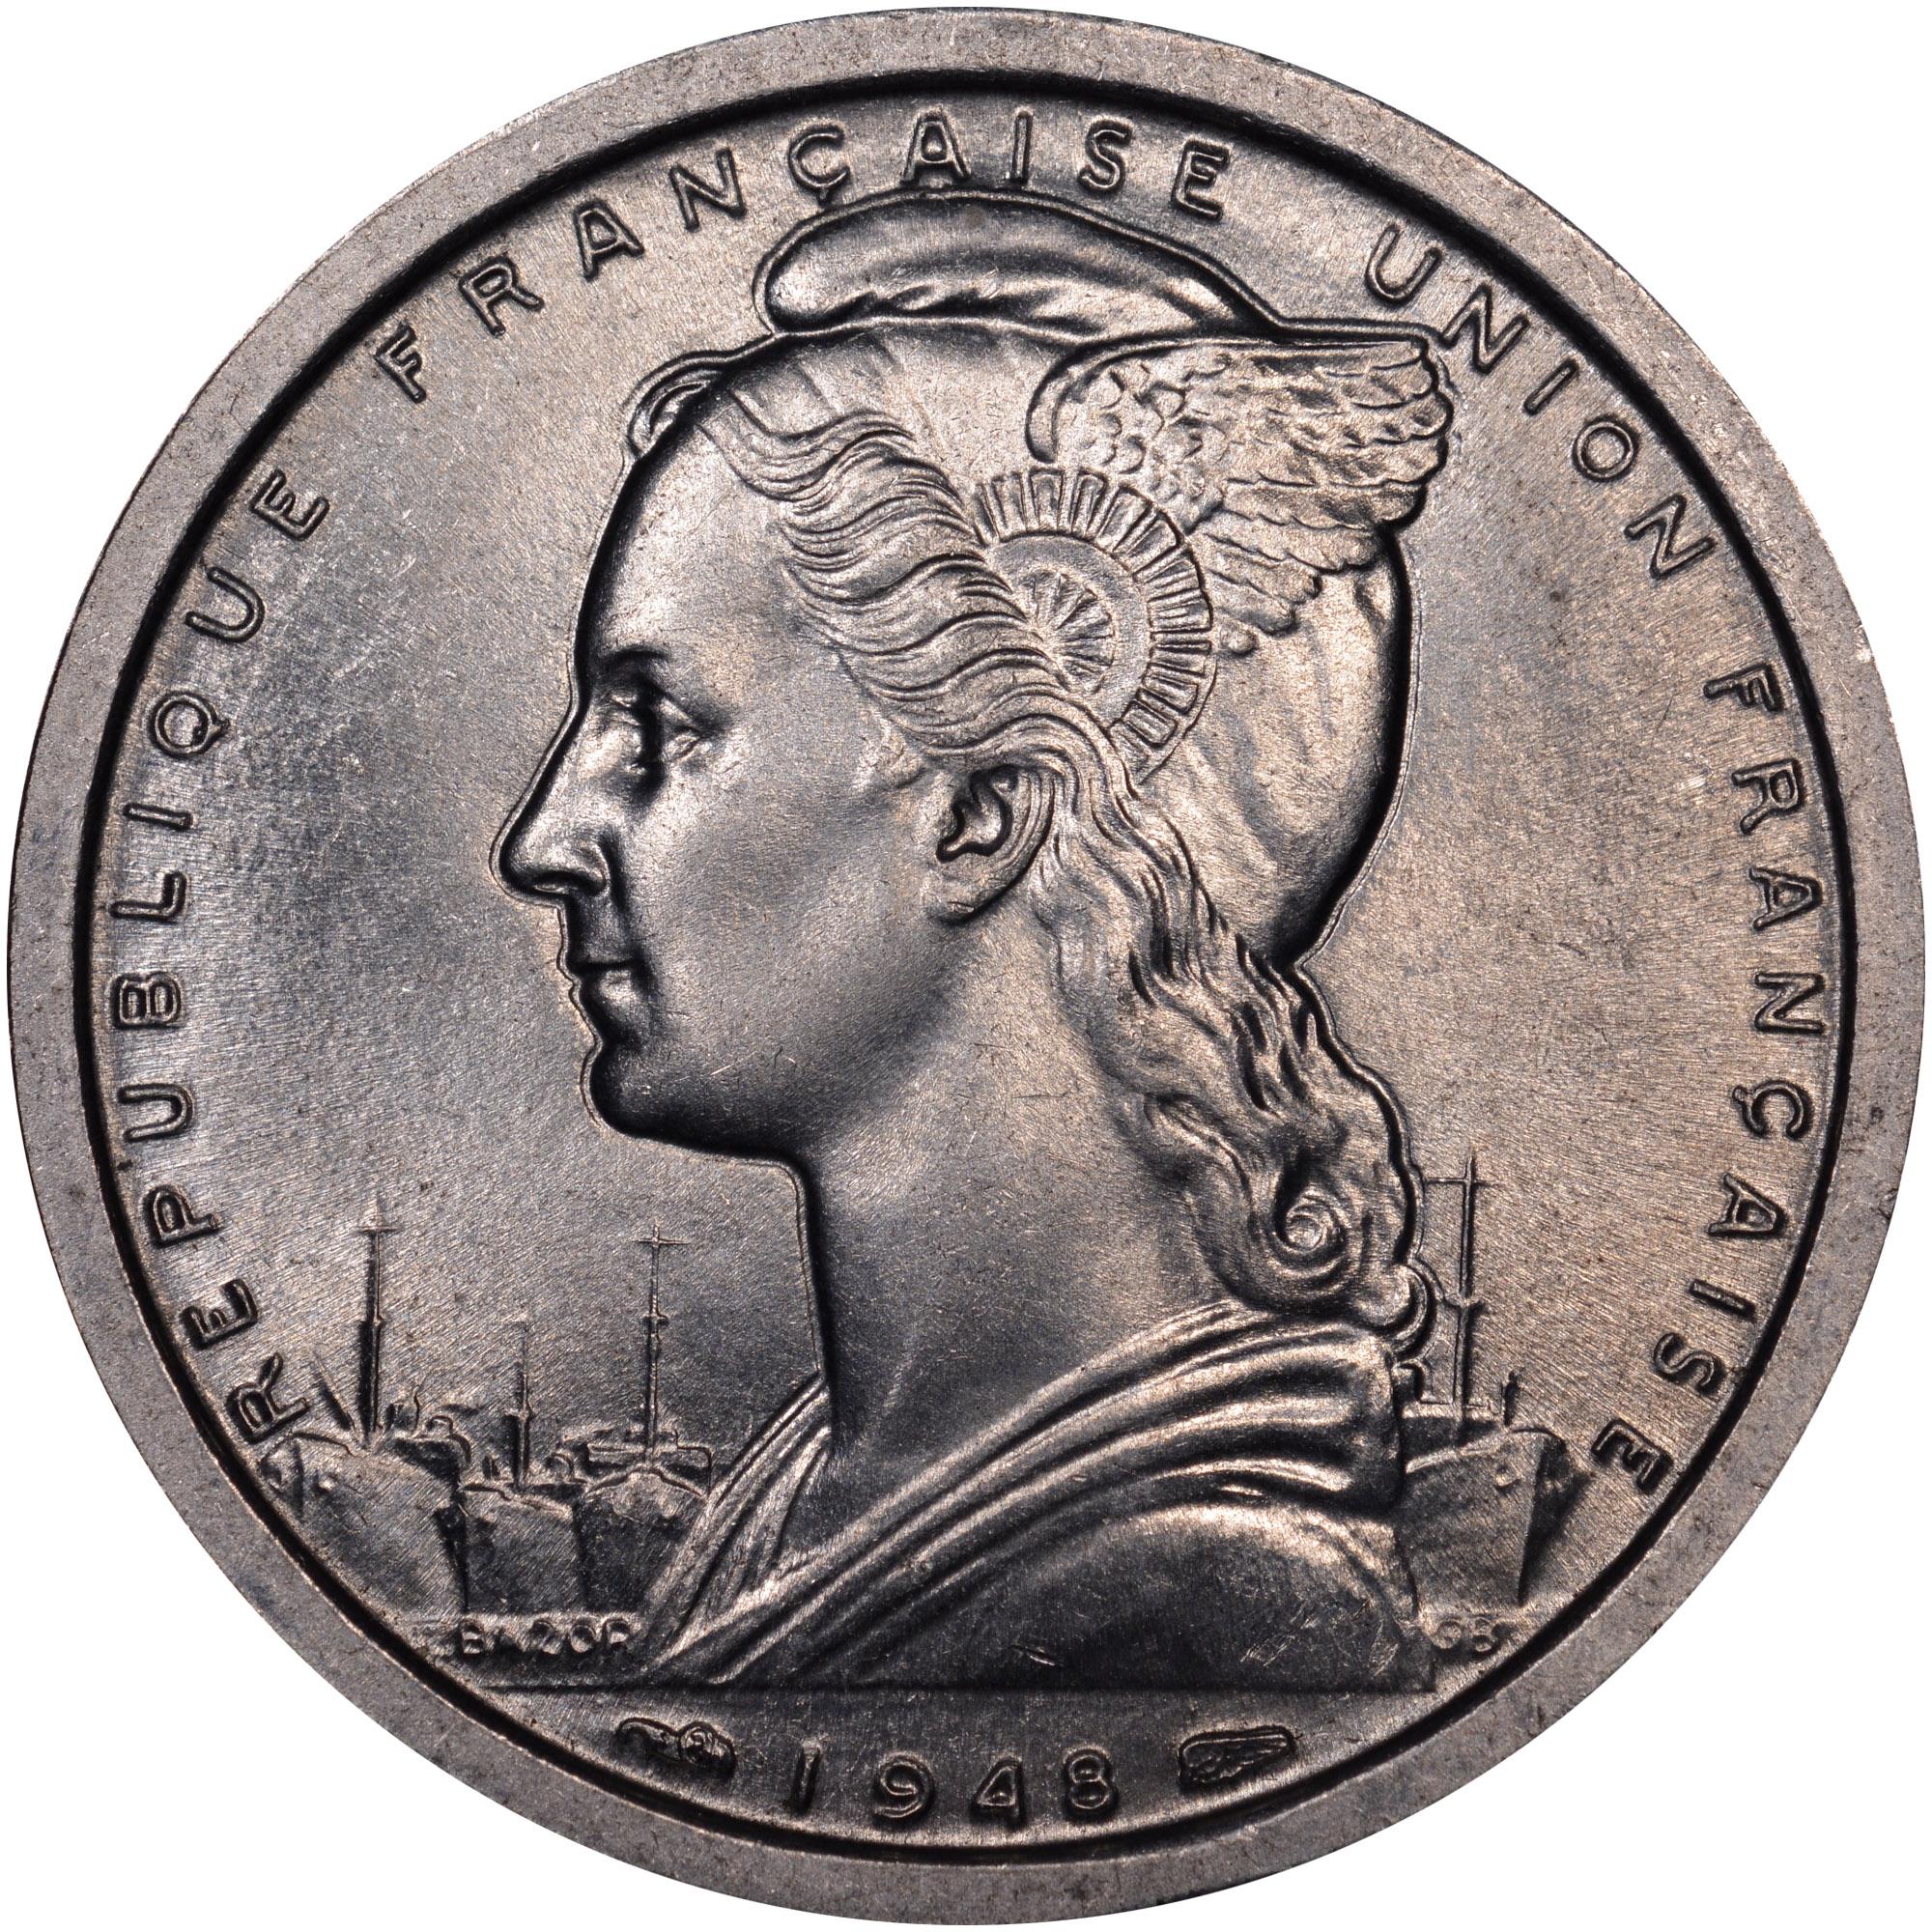 Cameroon 2 Francs obverse